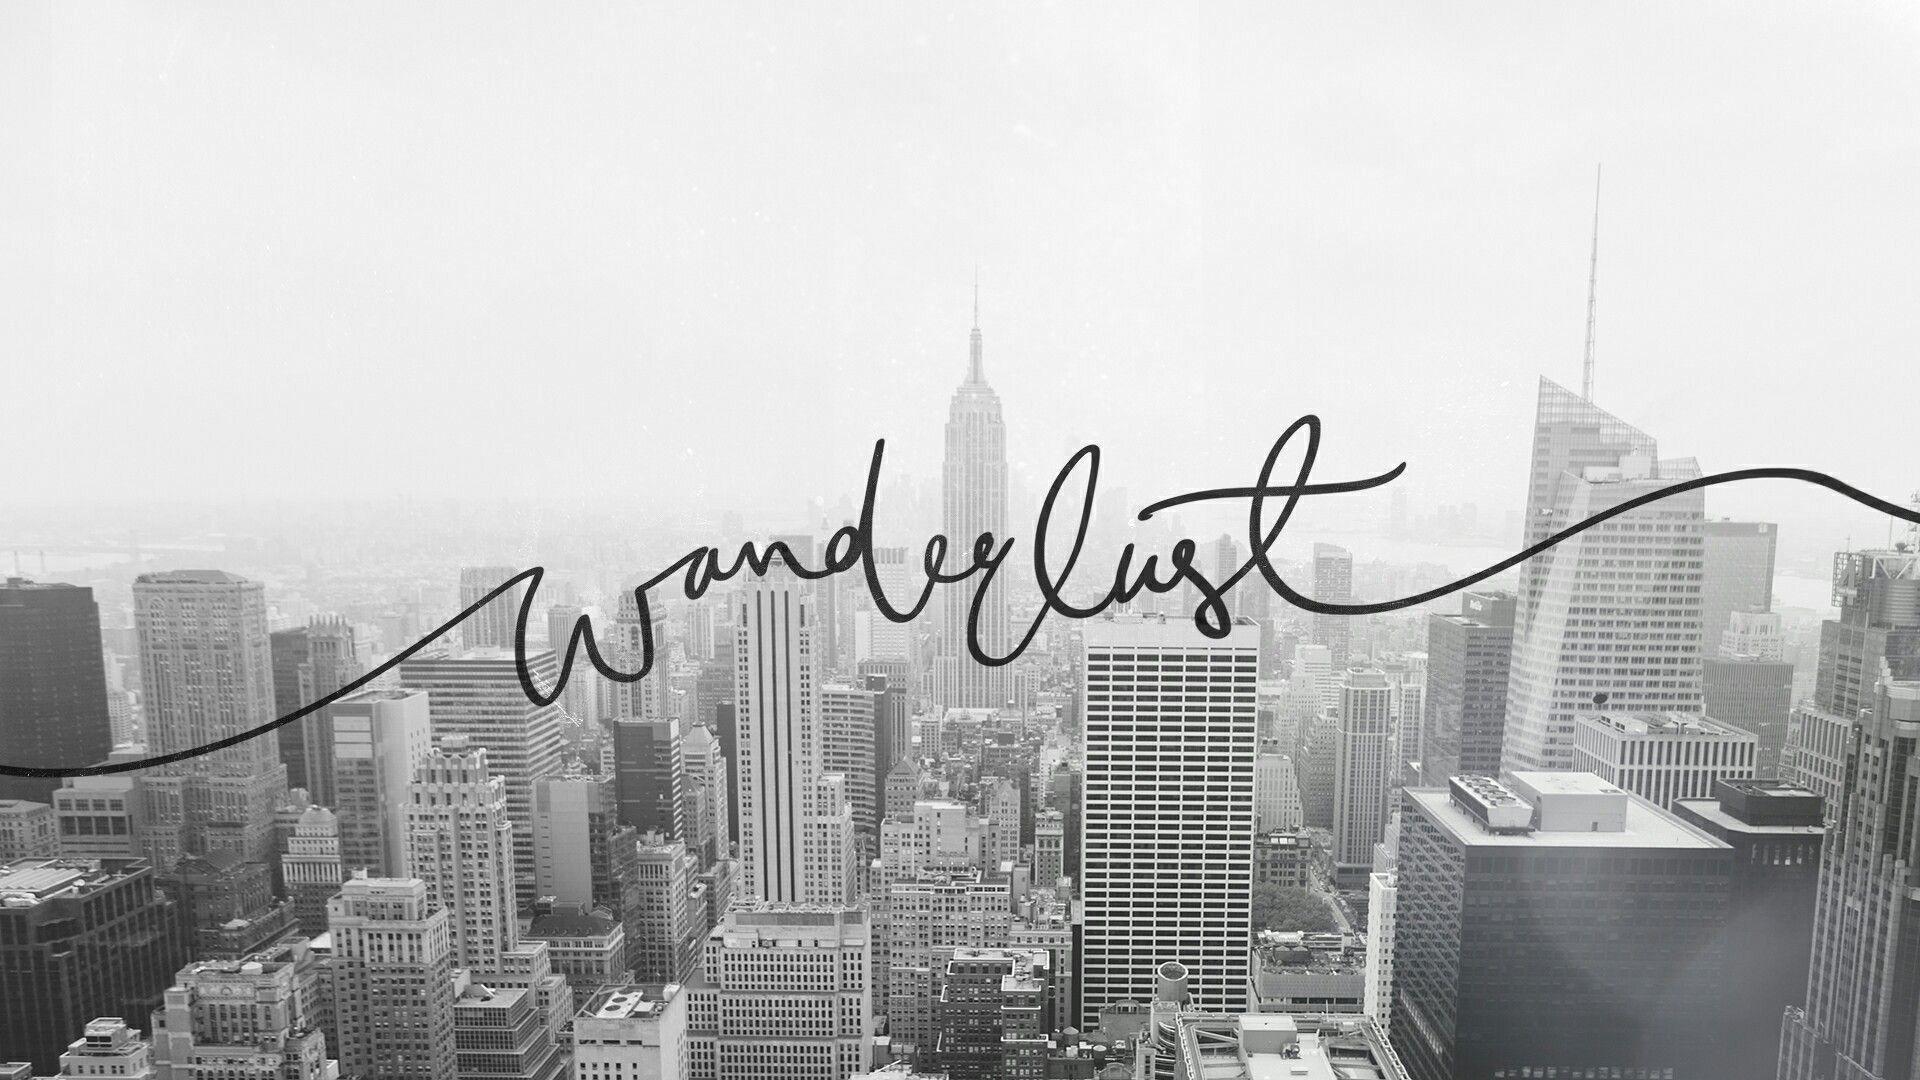 Wanderlust Wallpaper Pinterest Fondos Con Fondos De Pantalla Para Computadora Fondo De Pantalla Macbook Fondo De Pantalla Mac Fondos De Pantalla Para Portatil